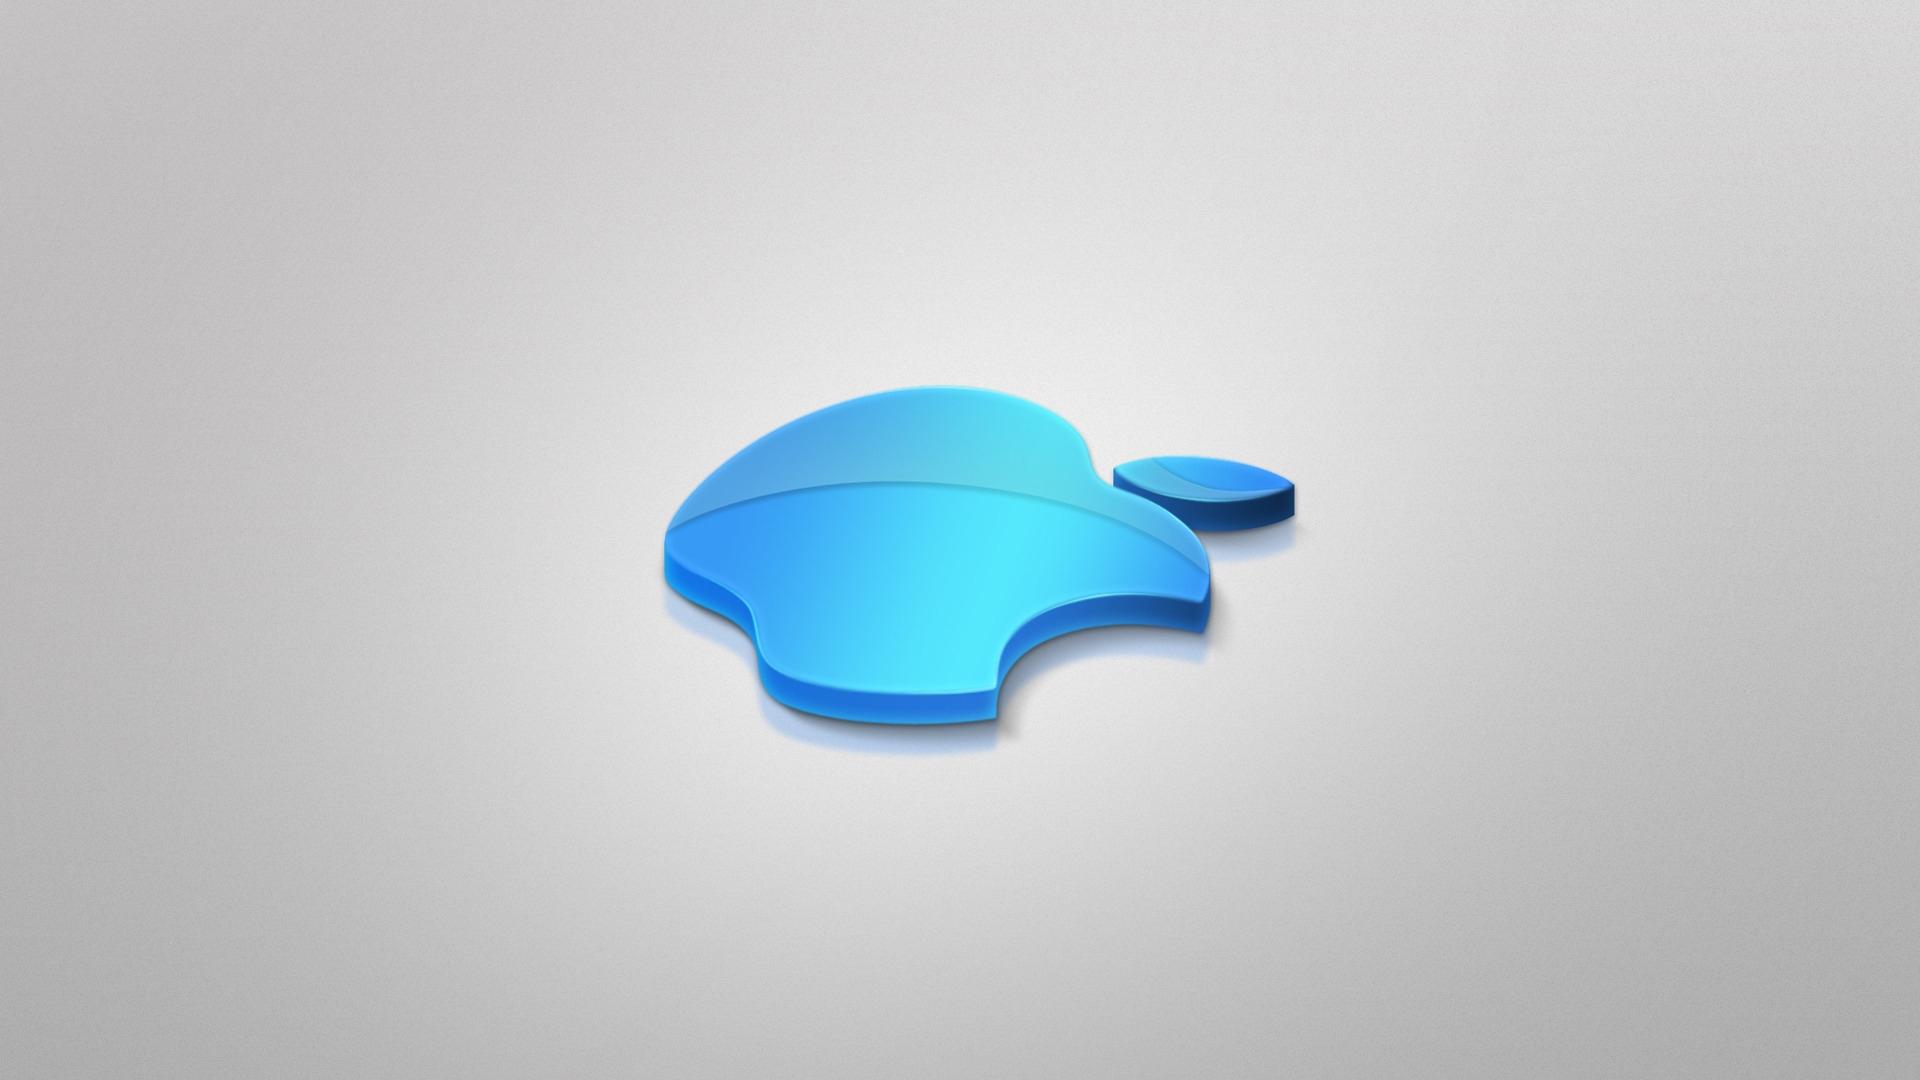 Most Inspiring Wallpaper Macbook Full Hd - mac_apple_logo_brand_74132_1920x1080  You Should Have_222771.jpg